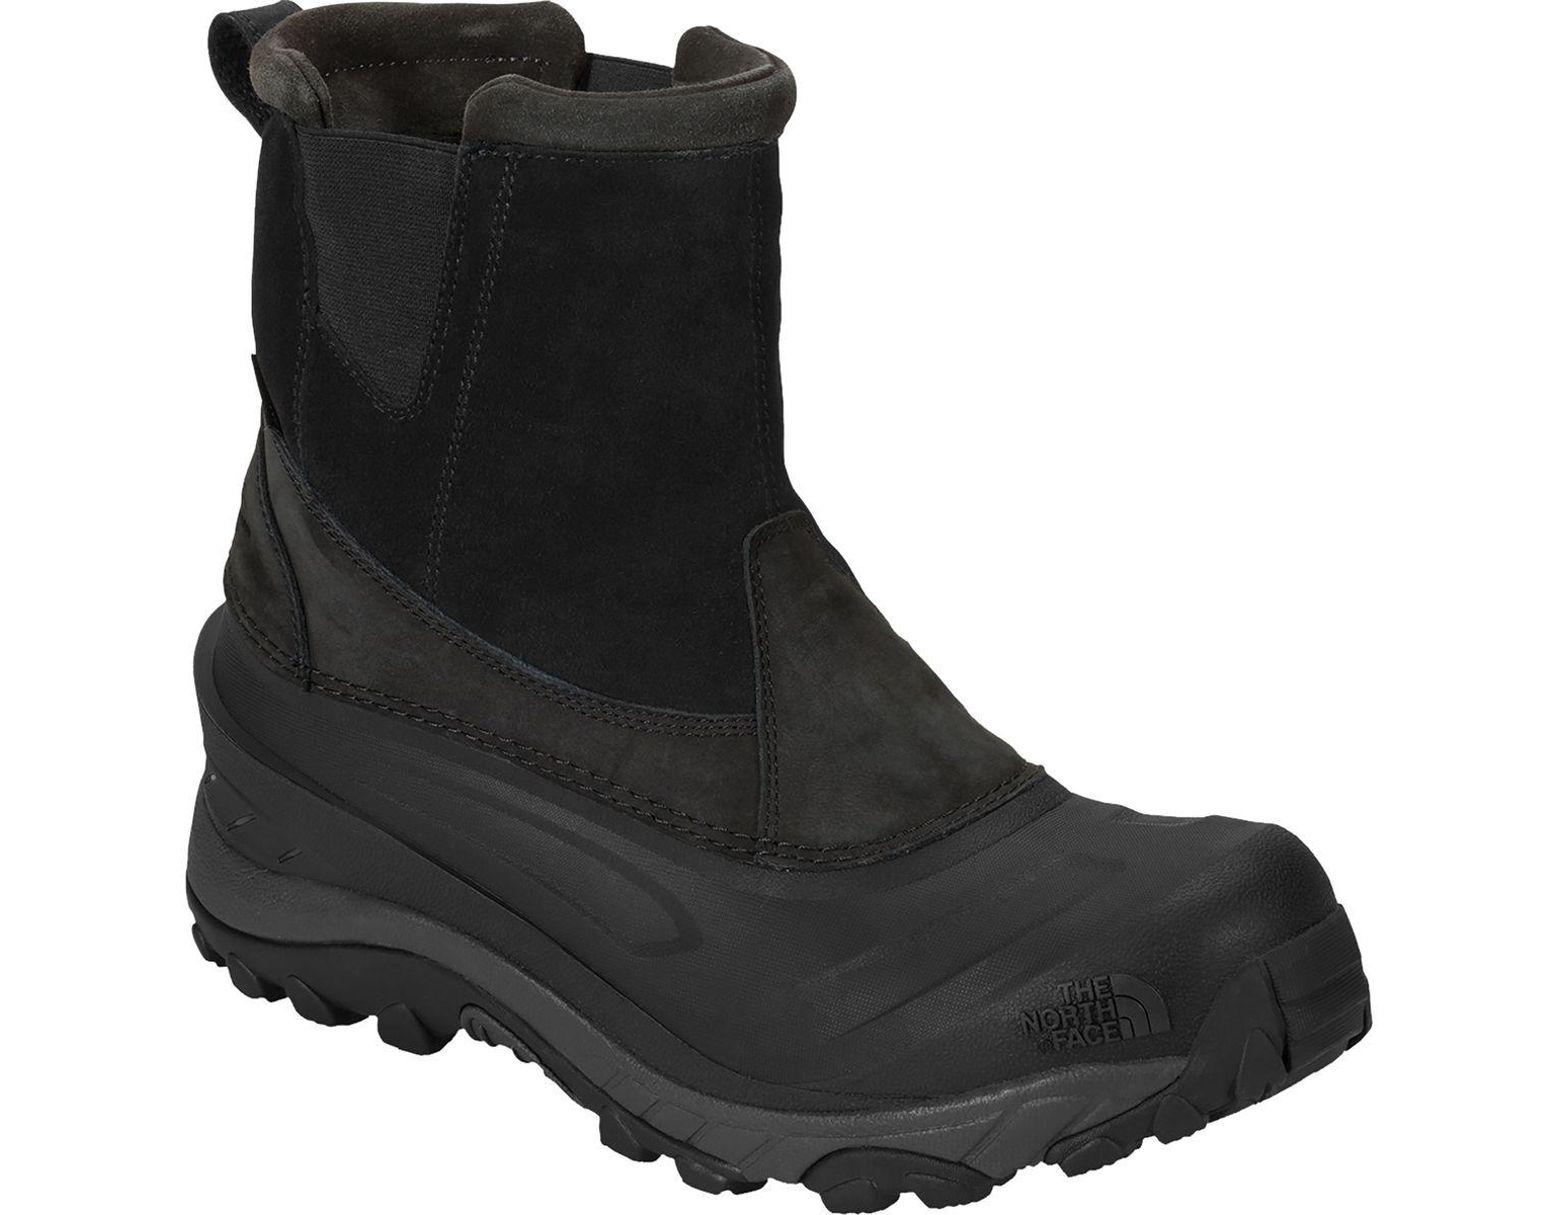 b92045ba546 Men's Black Chilkat Iii Pull-on Boot